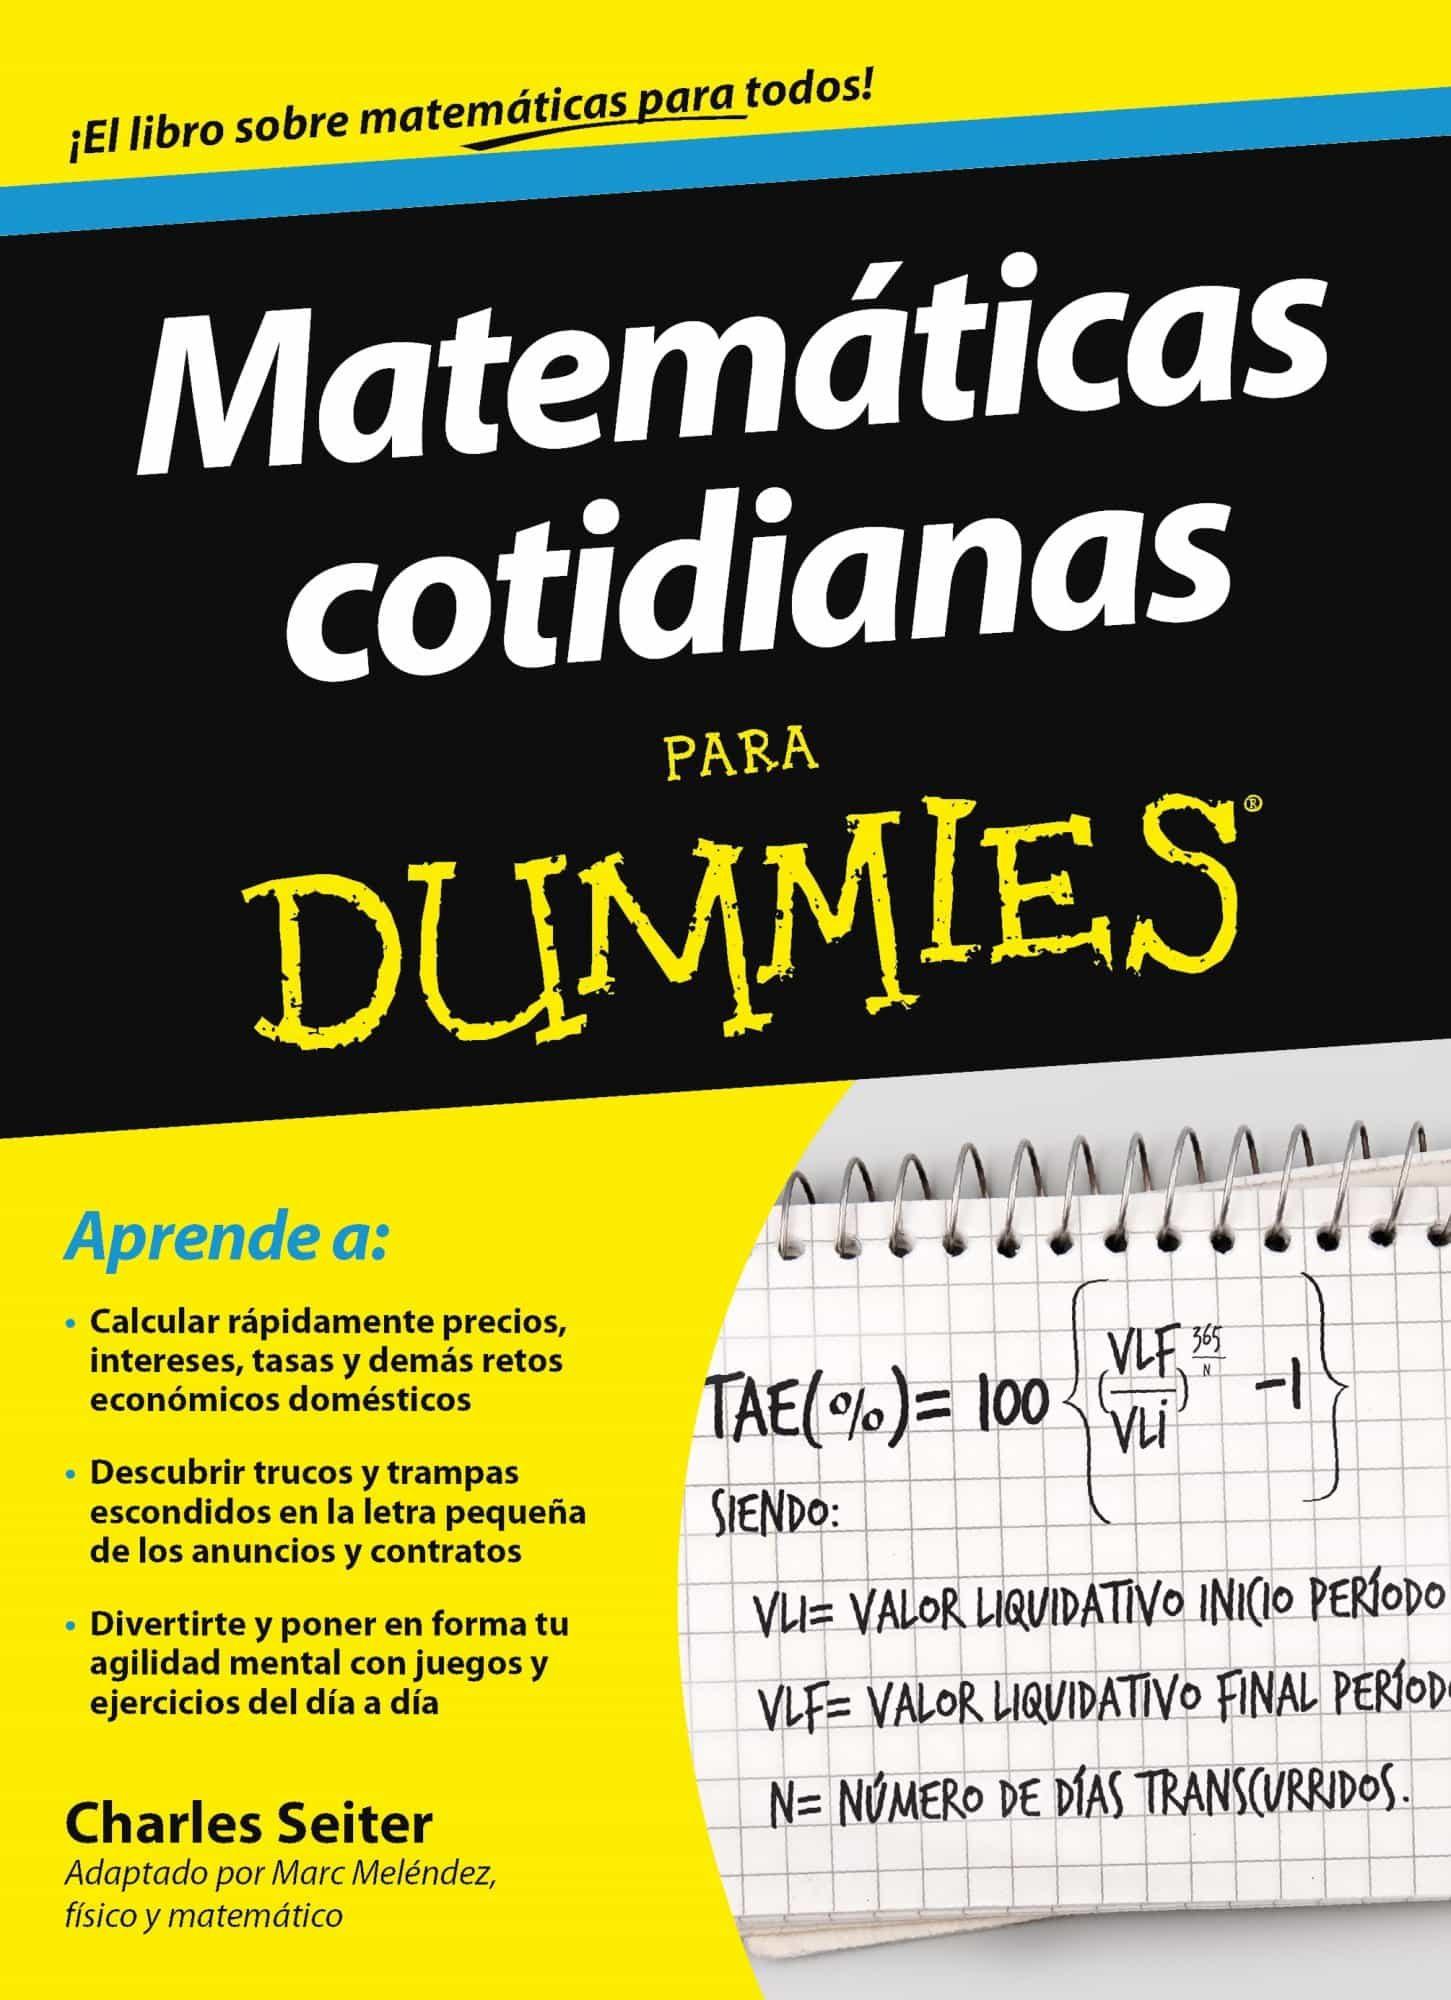 MATEMÁTICAS COTIDIANAS PARA DUMMIES | CHARLES SEITER | Comprar libro ...